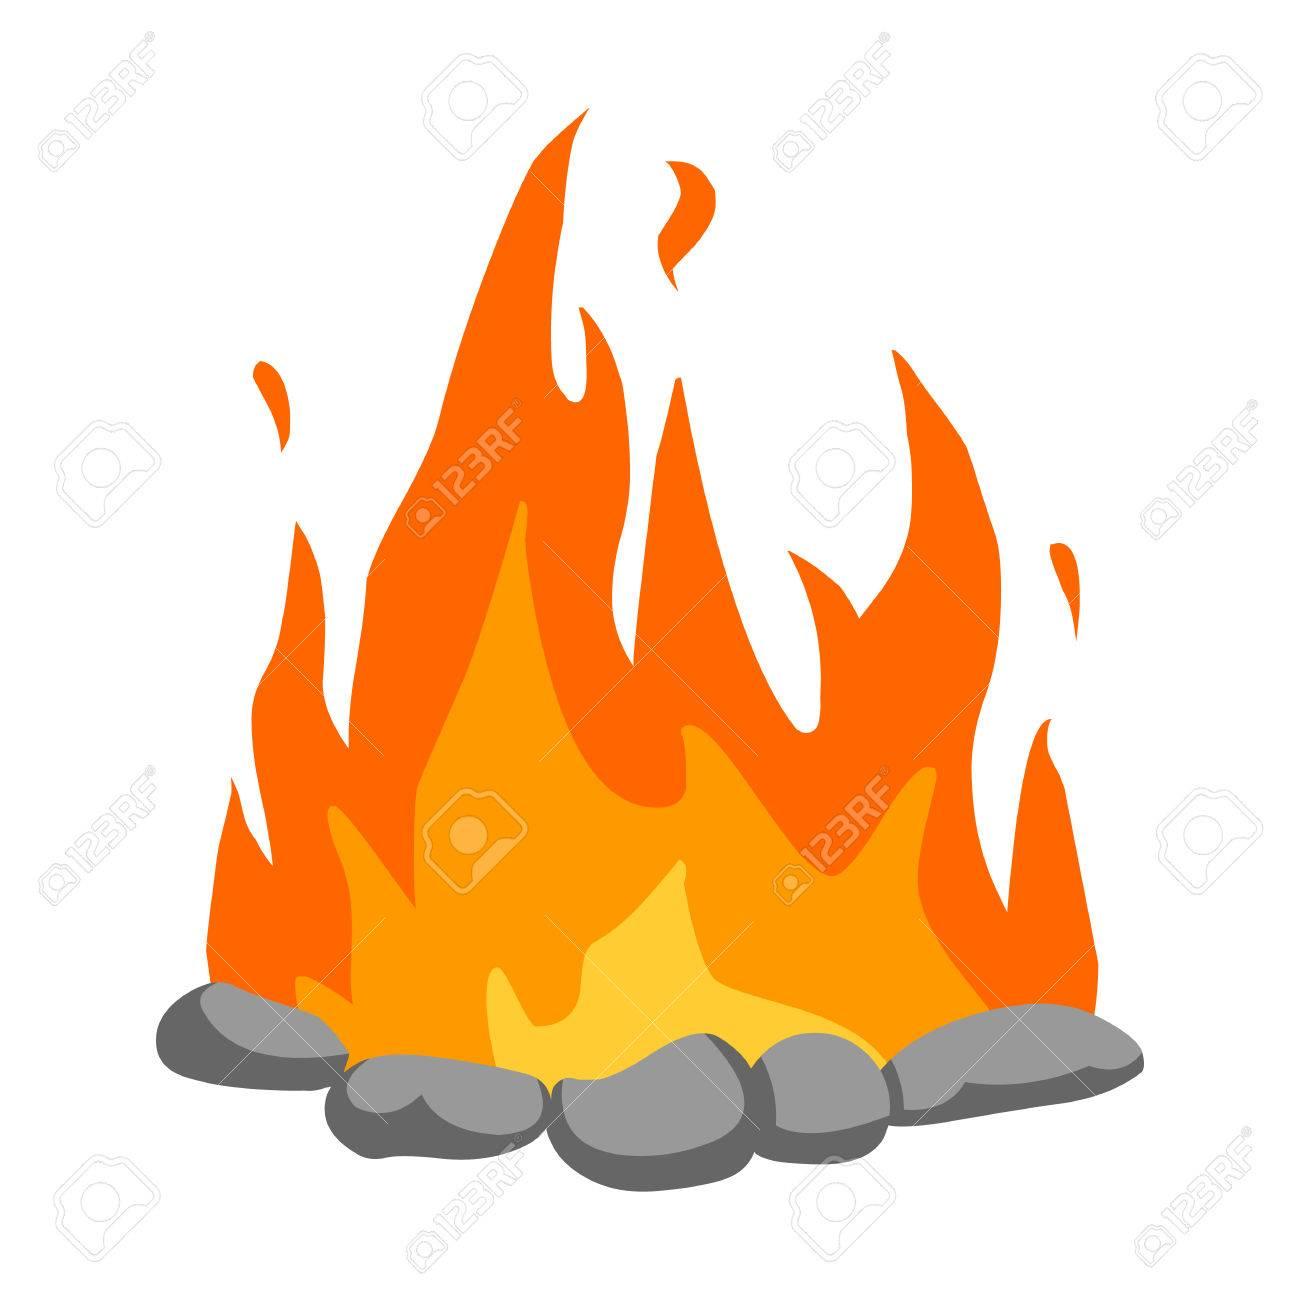 bonfire icon cartoon singe western icon from the wild west rh 123rf com cartoon bonfire images cartoon bonfire drawing